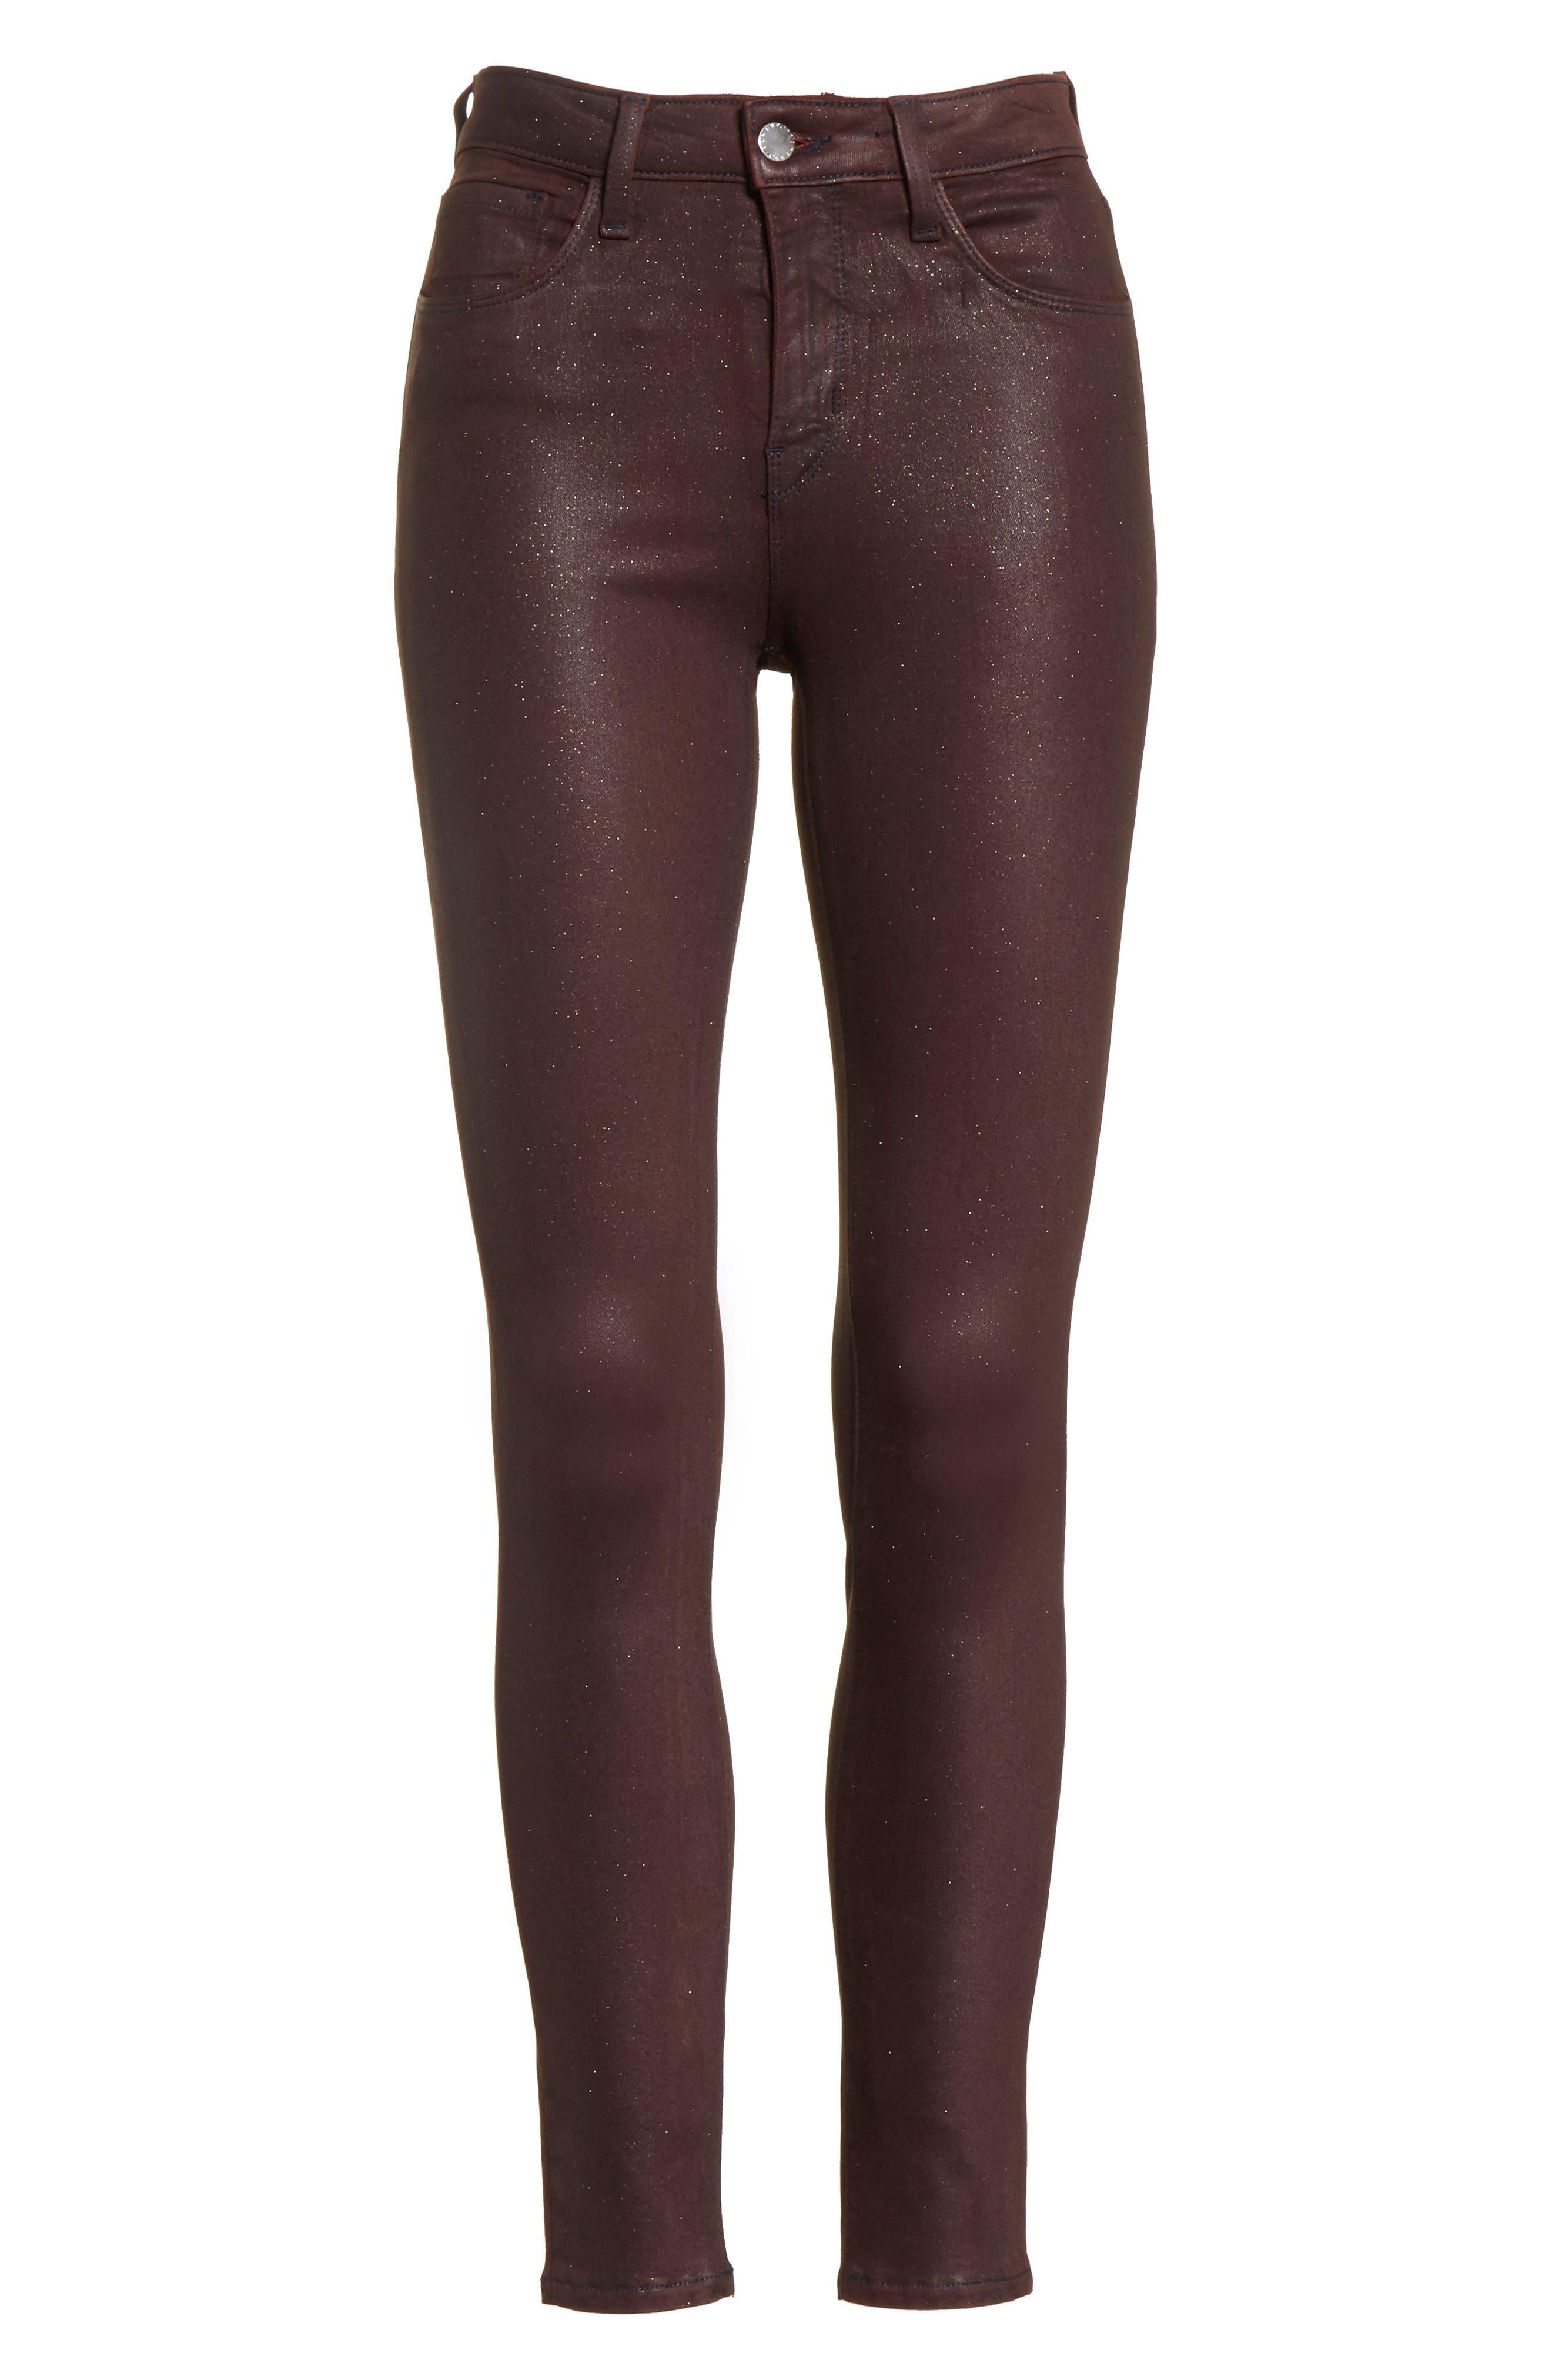 Margot High Waist Glitter Coated Jeans,                             Alternate thumbnail 6, color,                             Bordeaux Glitter Coated